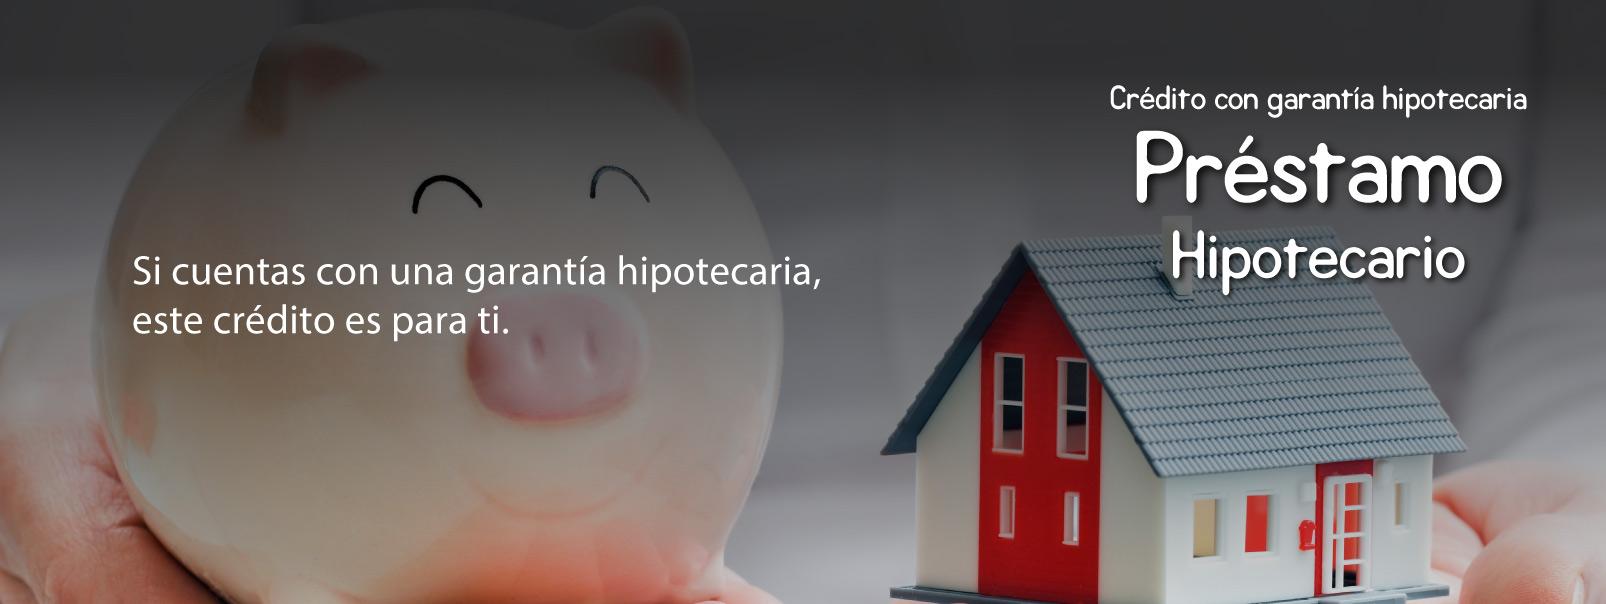 hipotecario cgv